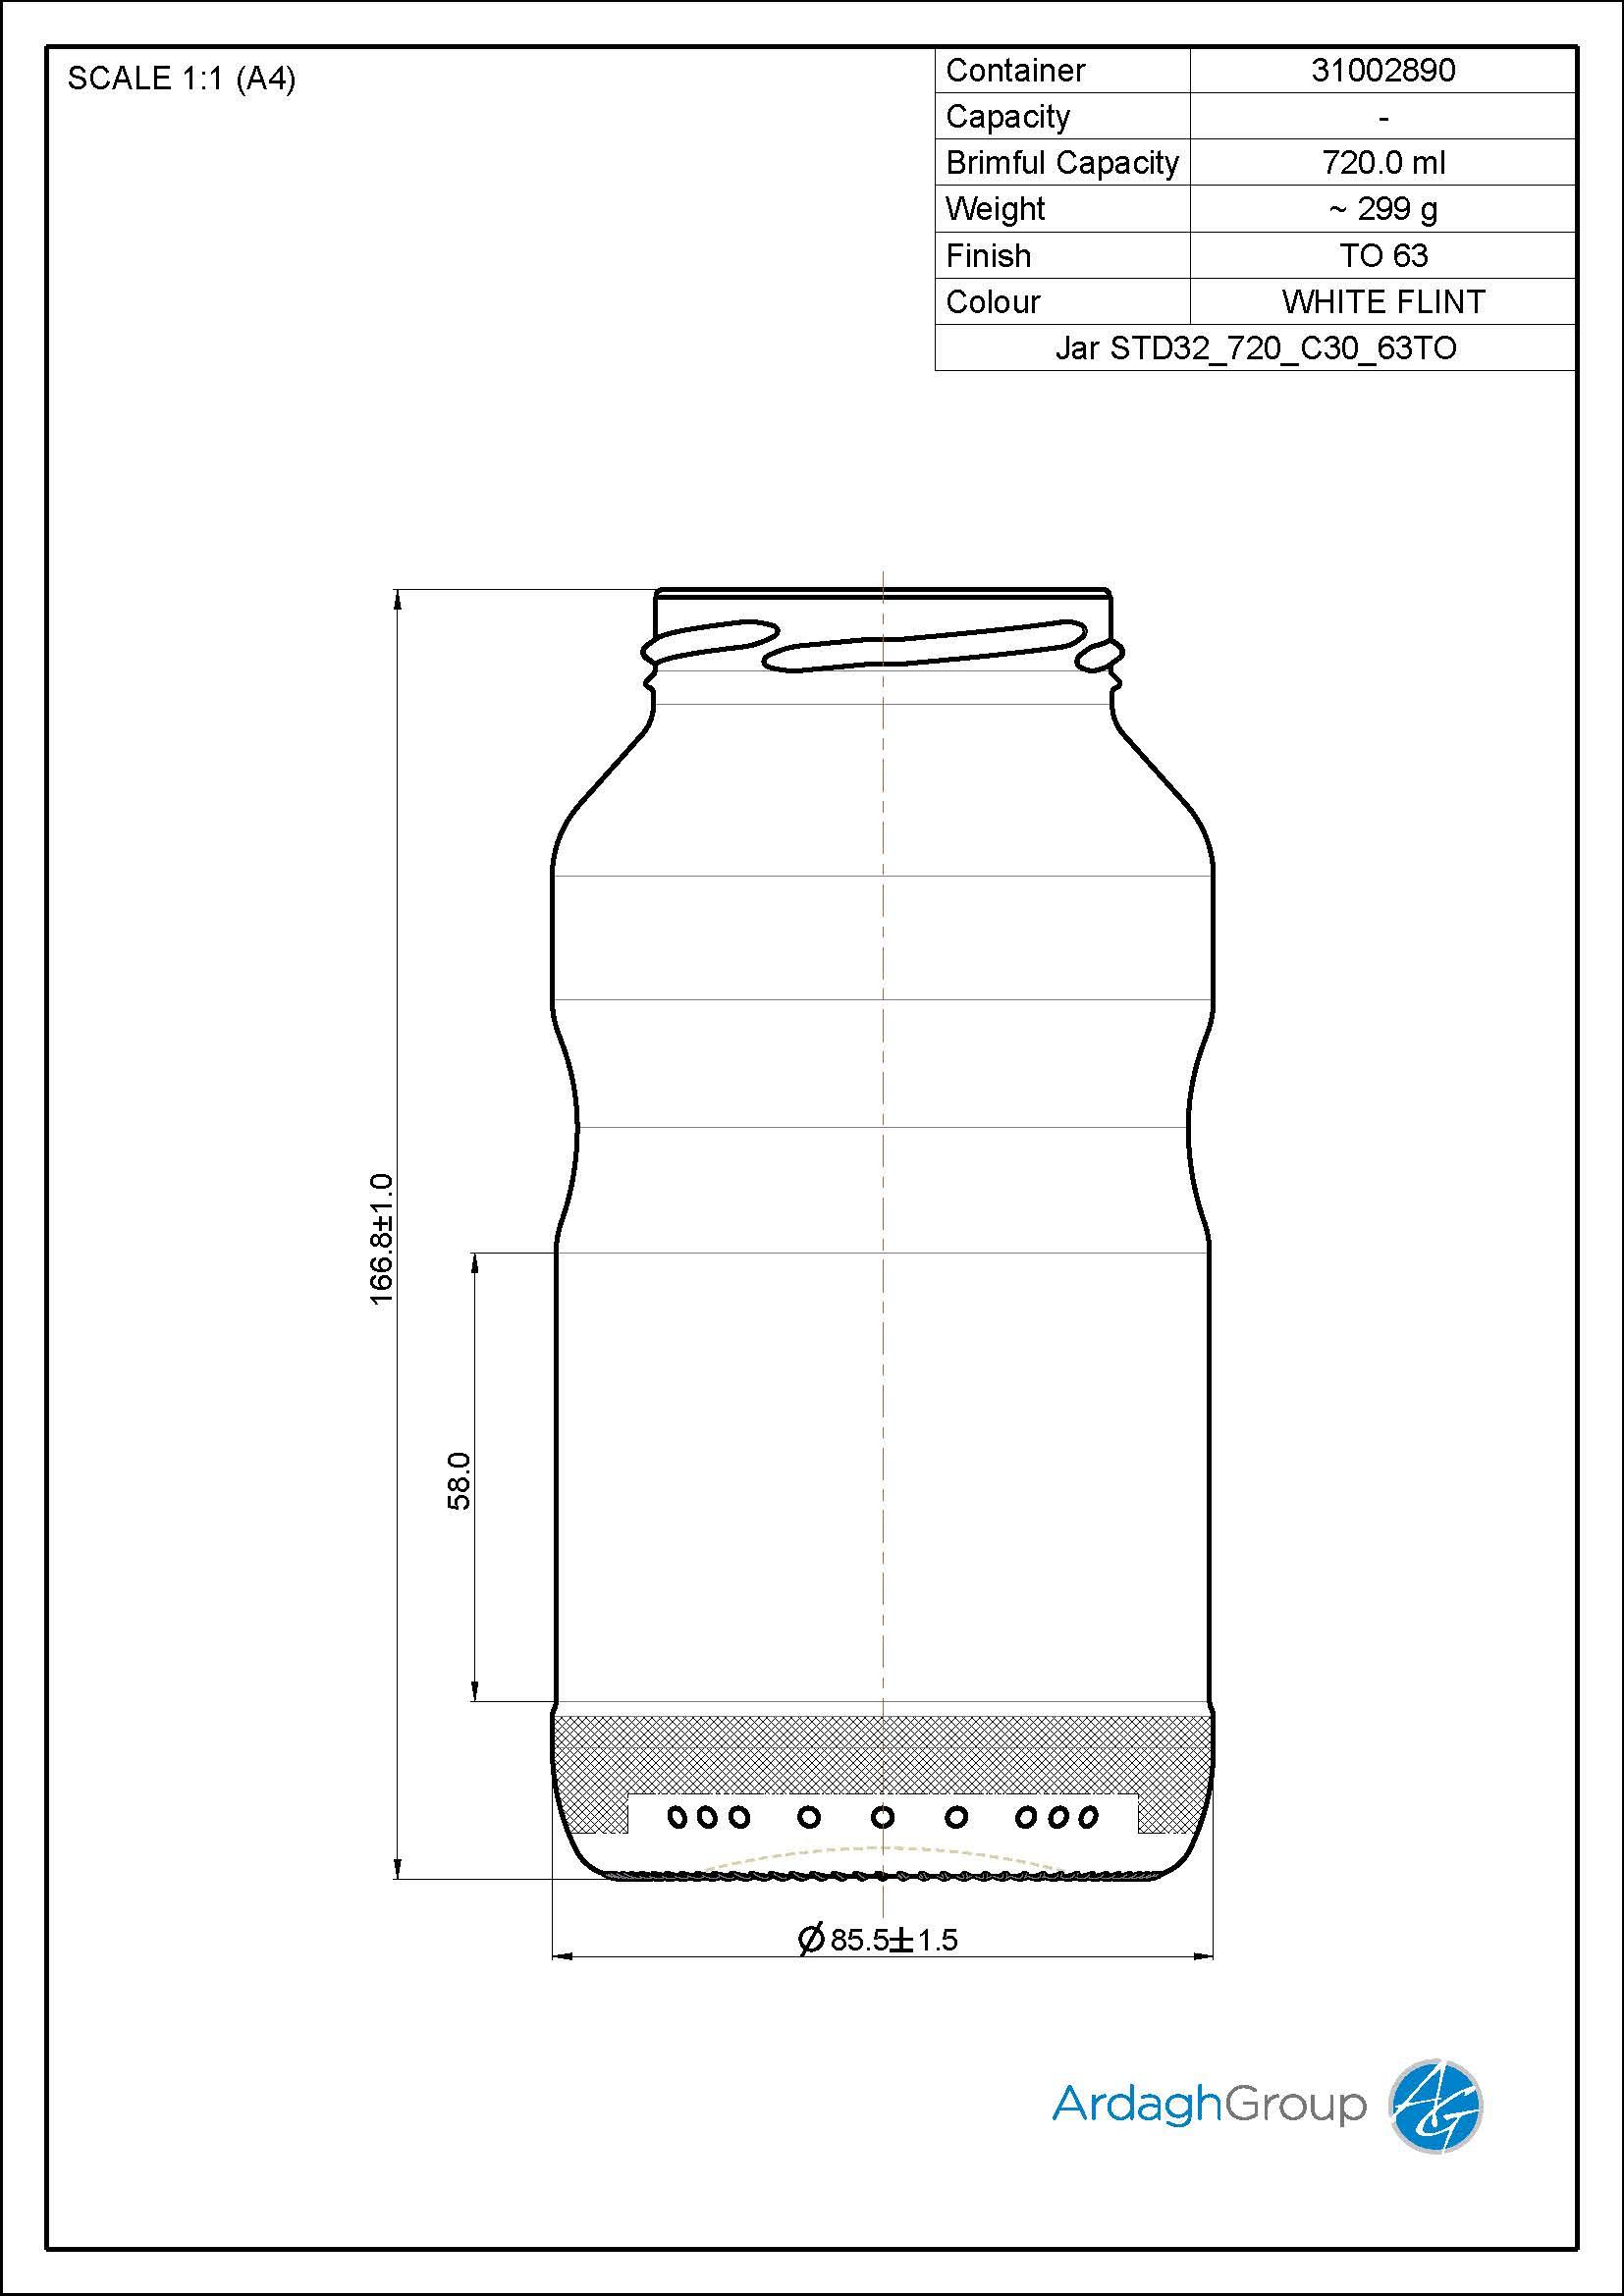 Jar STD32 720 C30 63TO